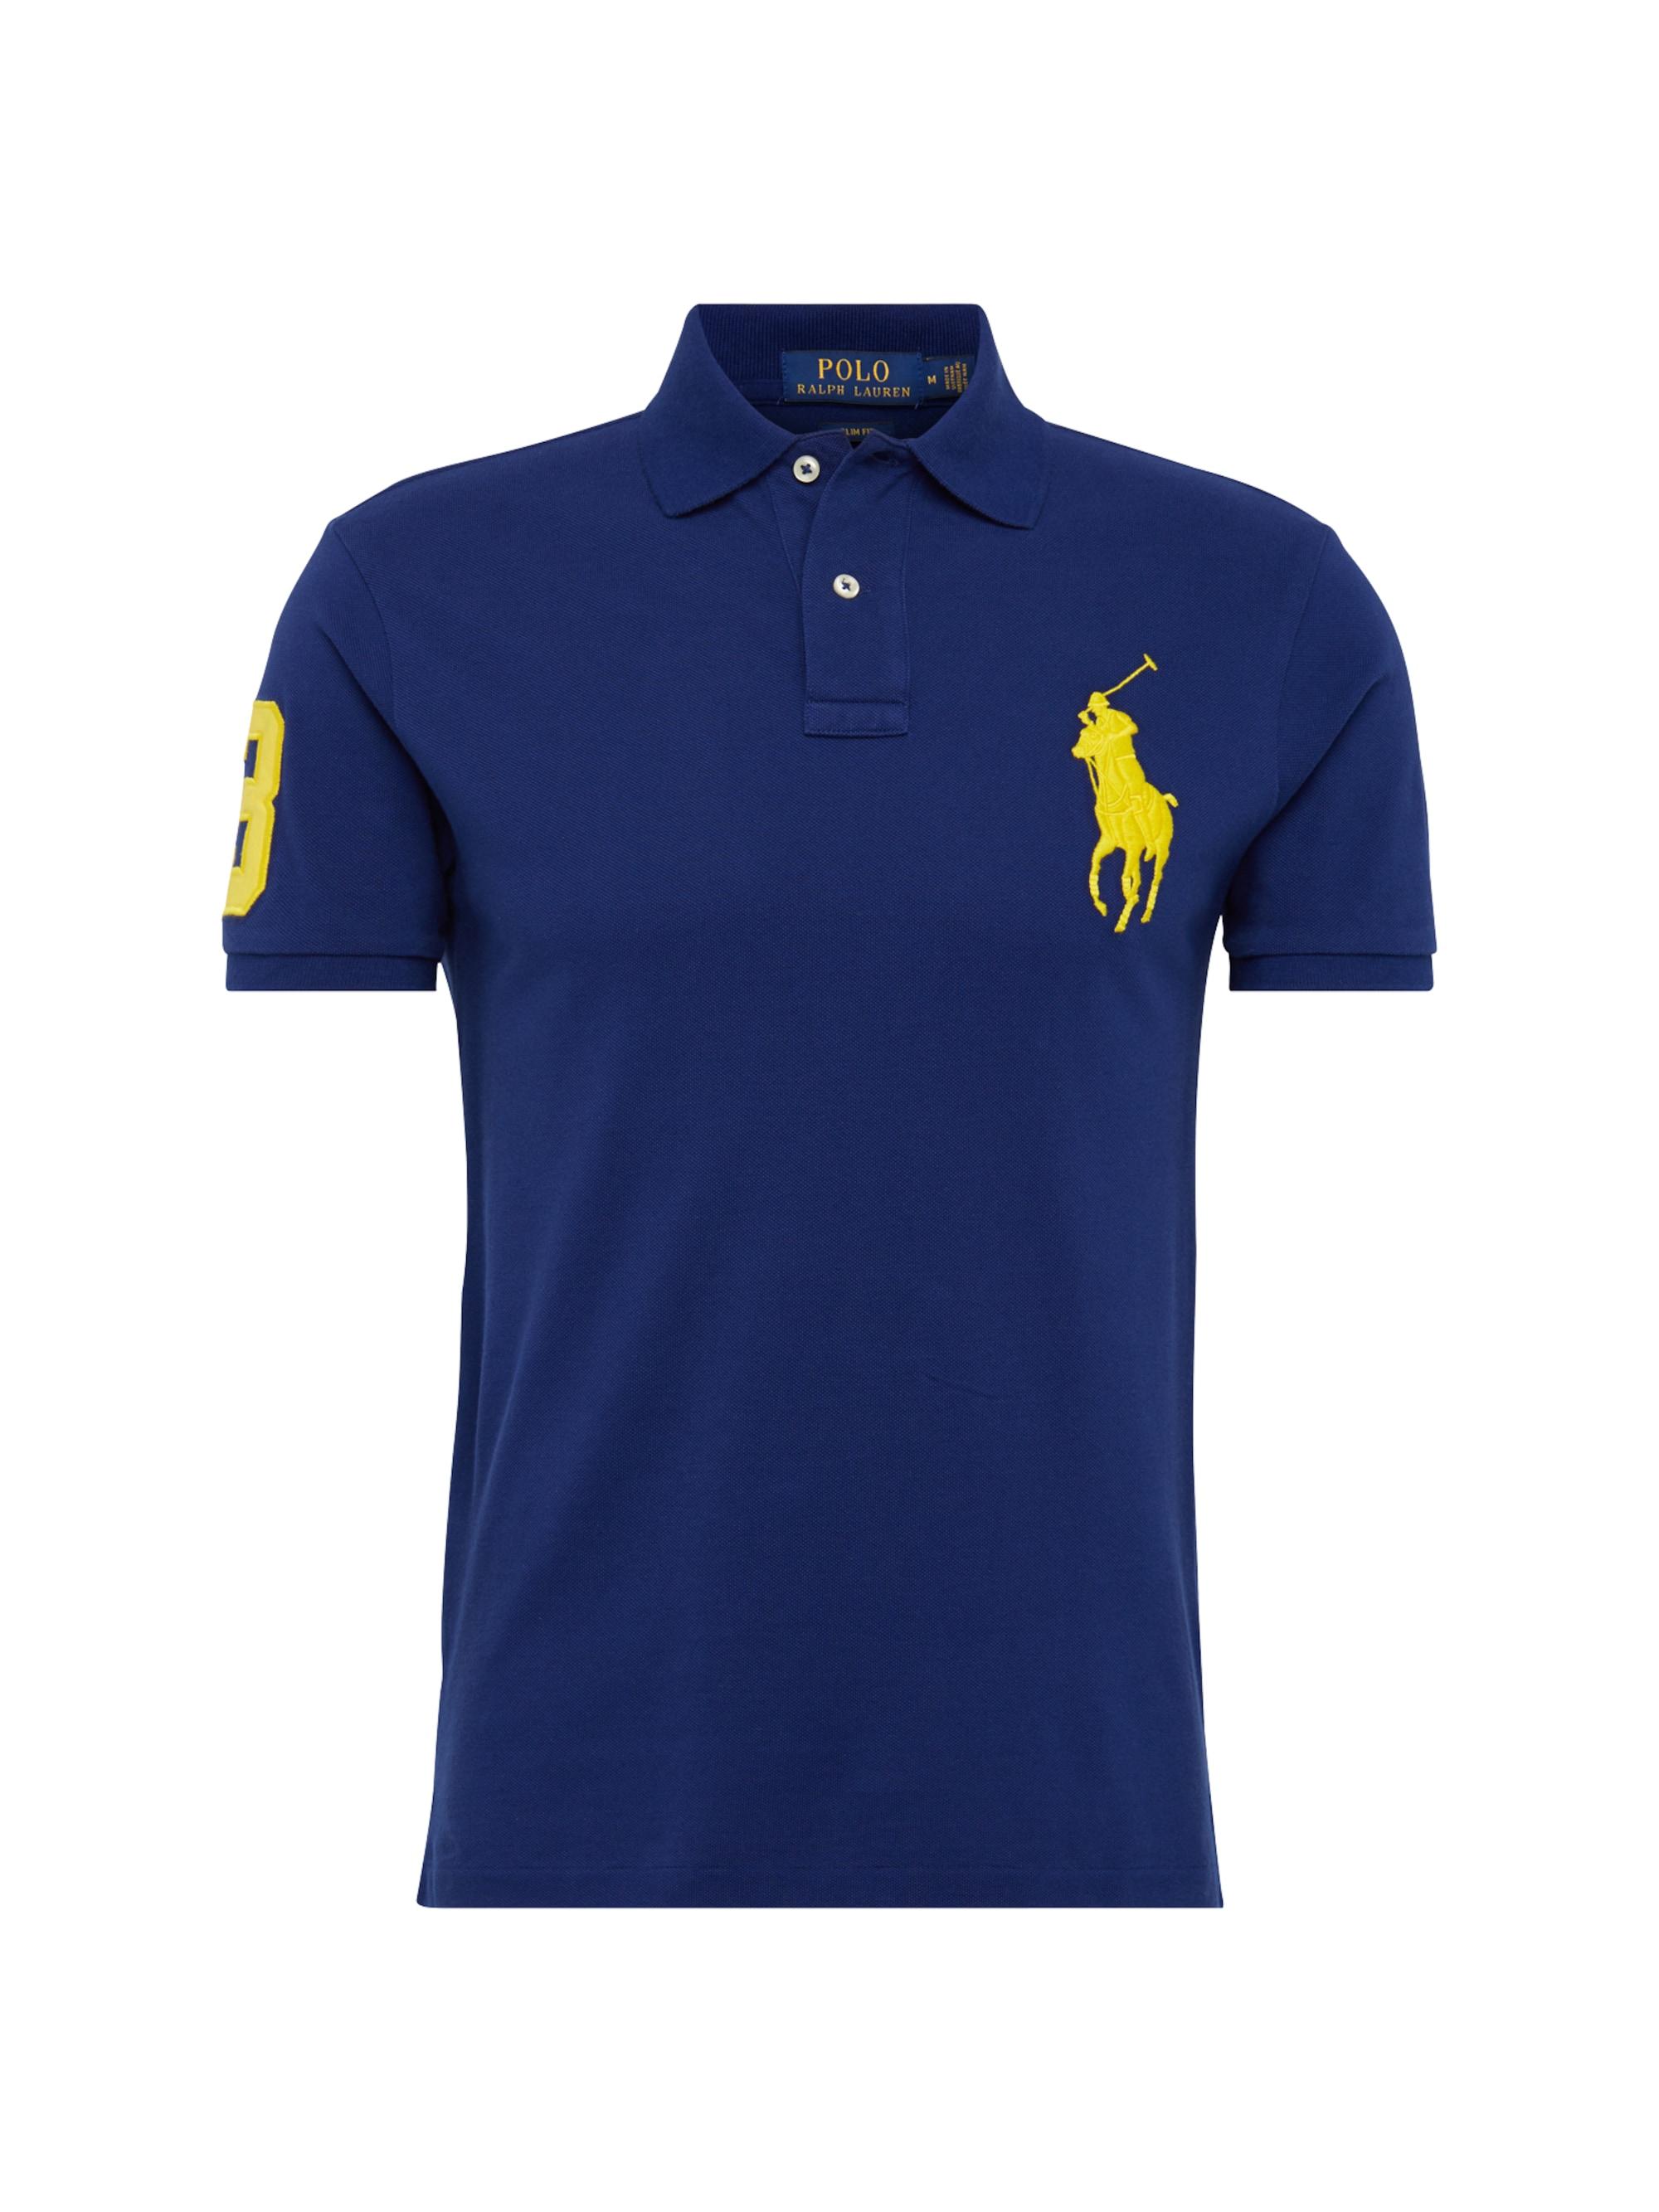 Image of POLO RALPH LAUREN, Heren Shirt SSKCBPSLMM1-SHORT SLEEVE-KNIT, royal blue/koningsblauw